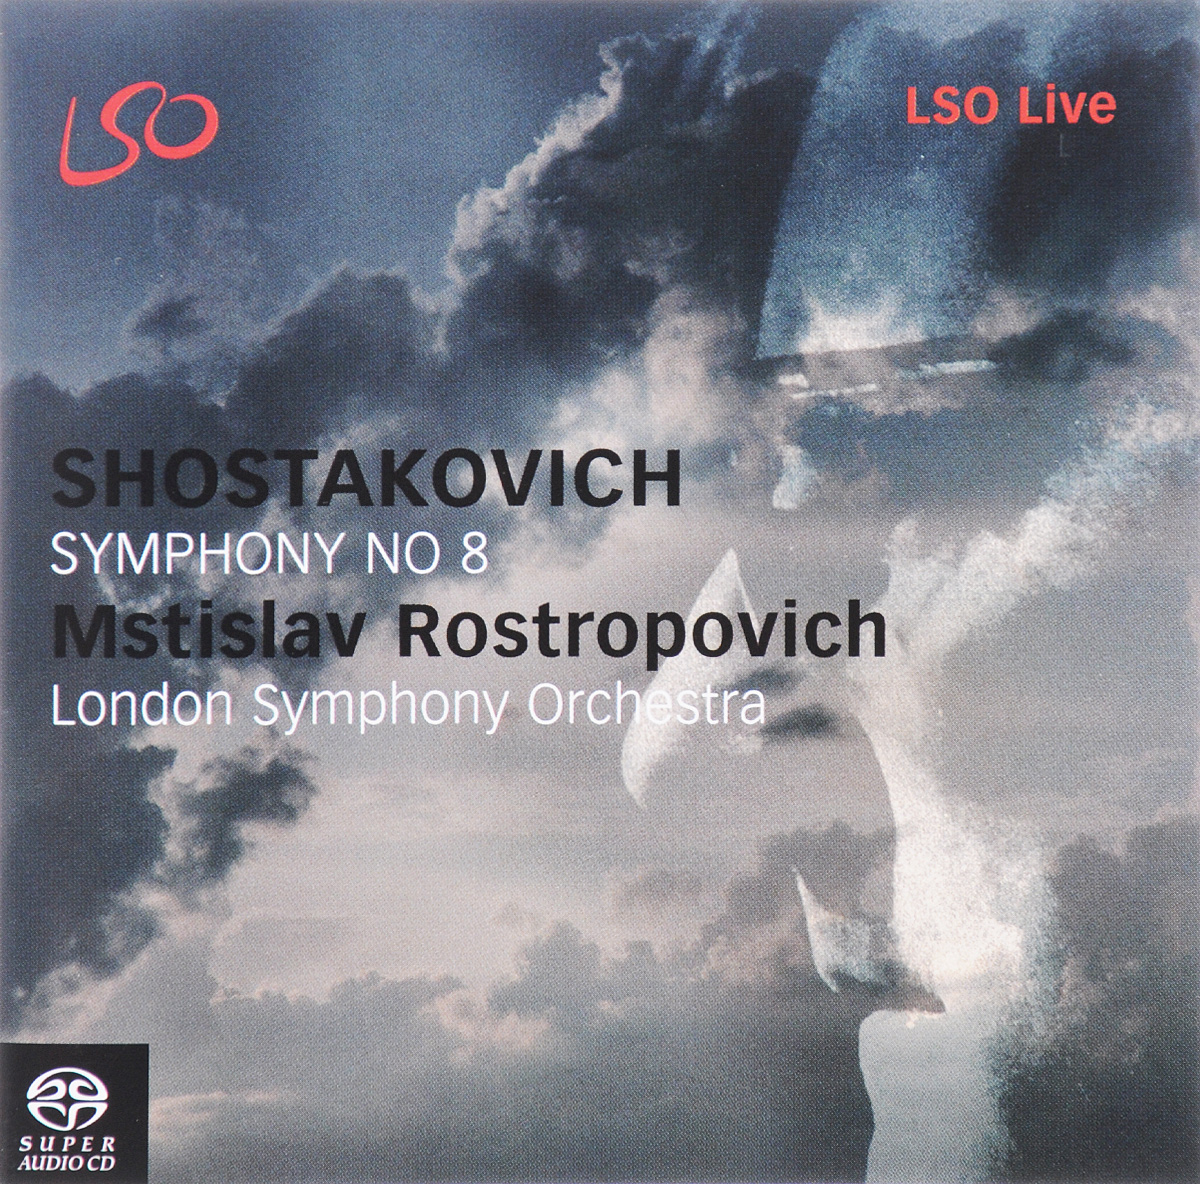 цена на Мстислав Ростропович,The London Symphony Orchestra Mstislav Rostropovich. Shostakovich. Symphony No. 8 (SACD)